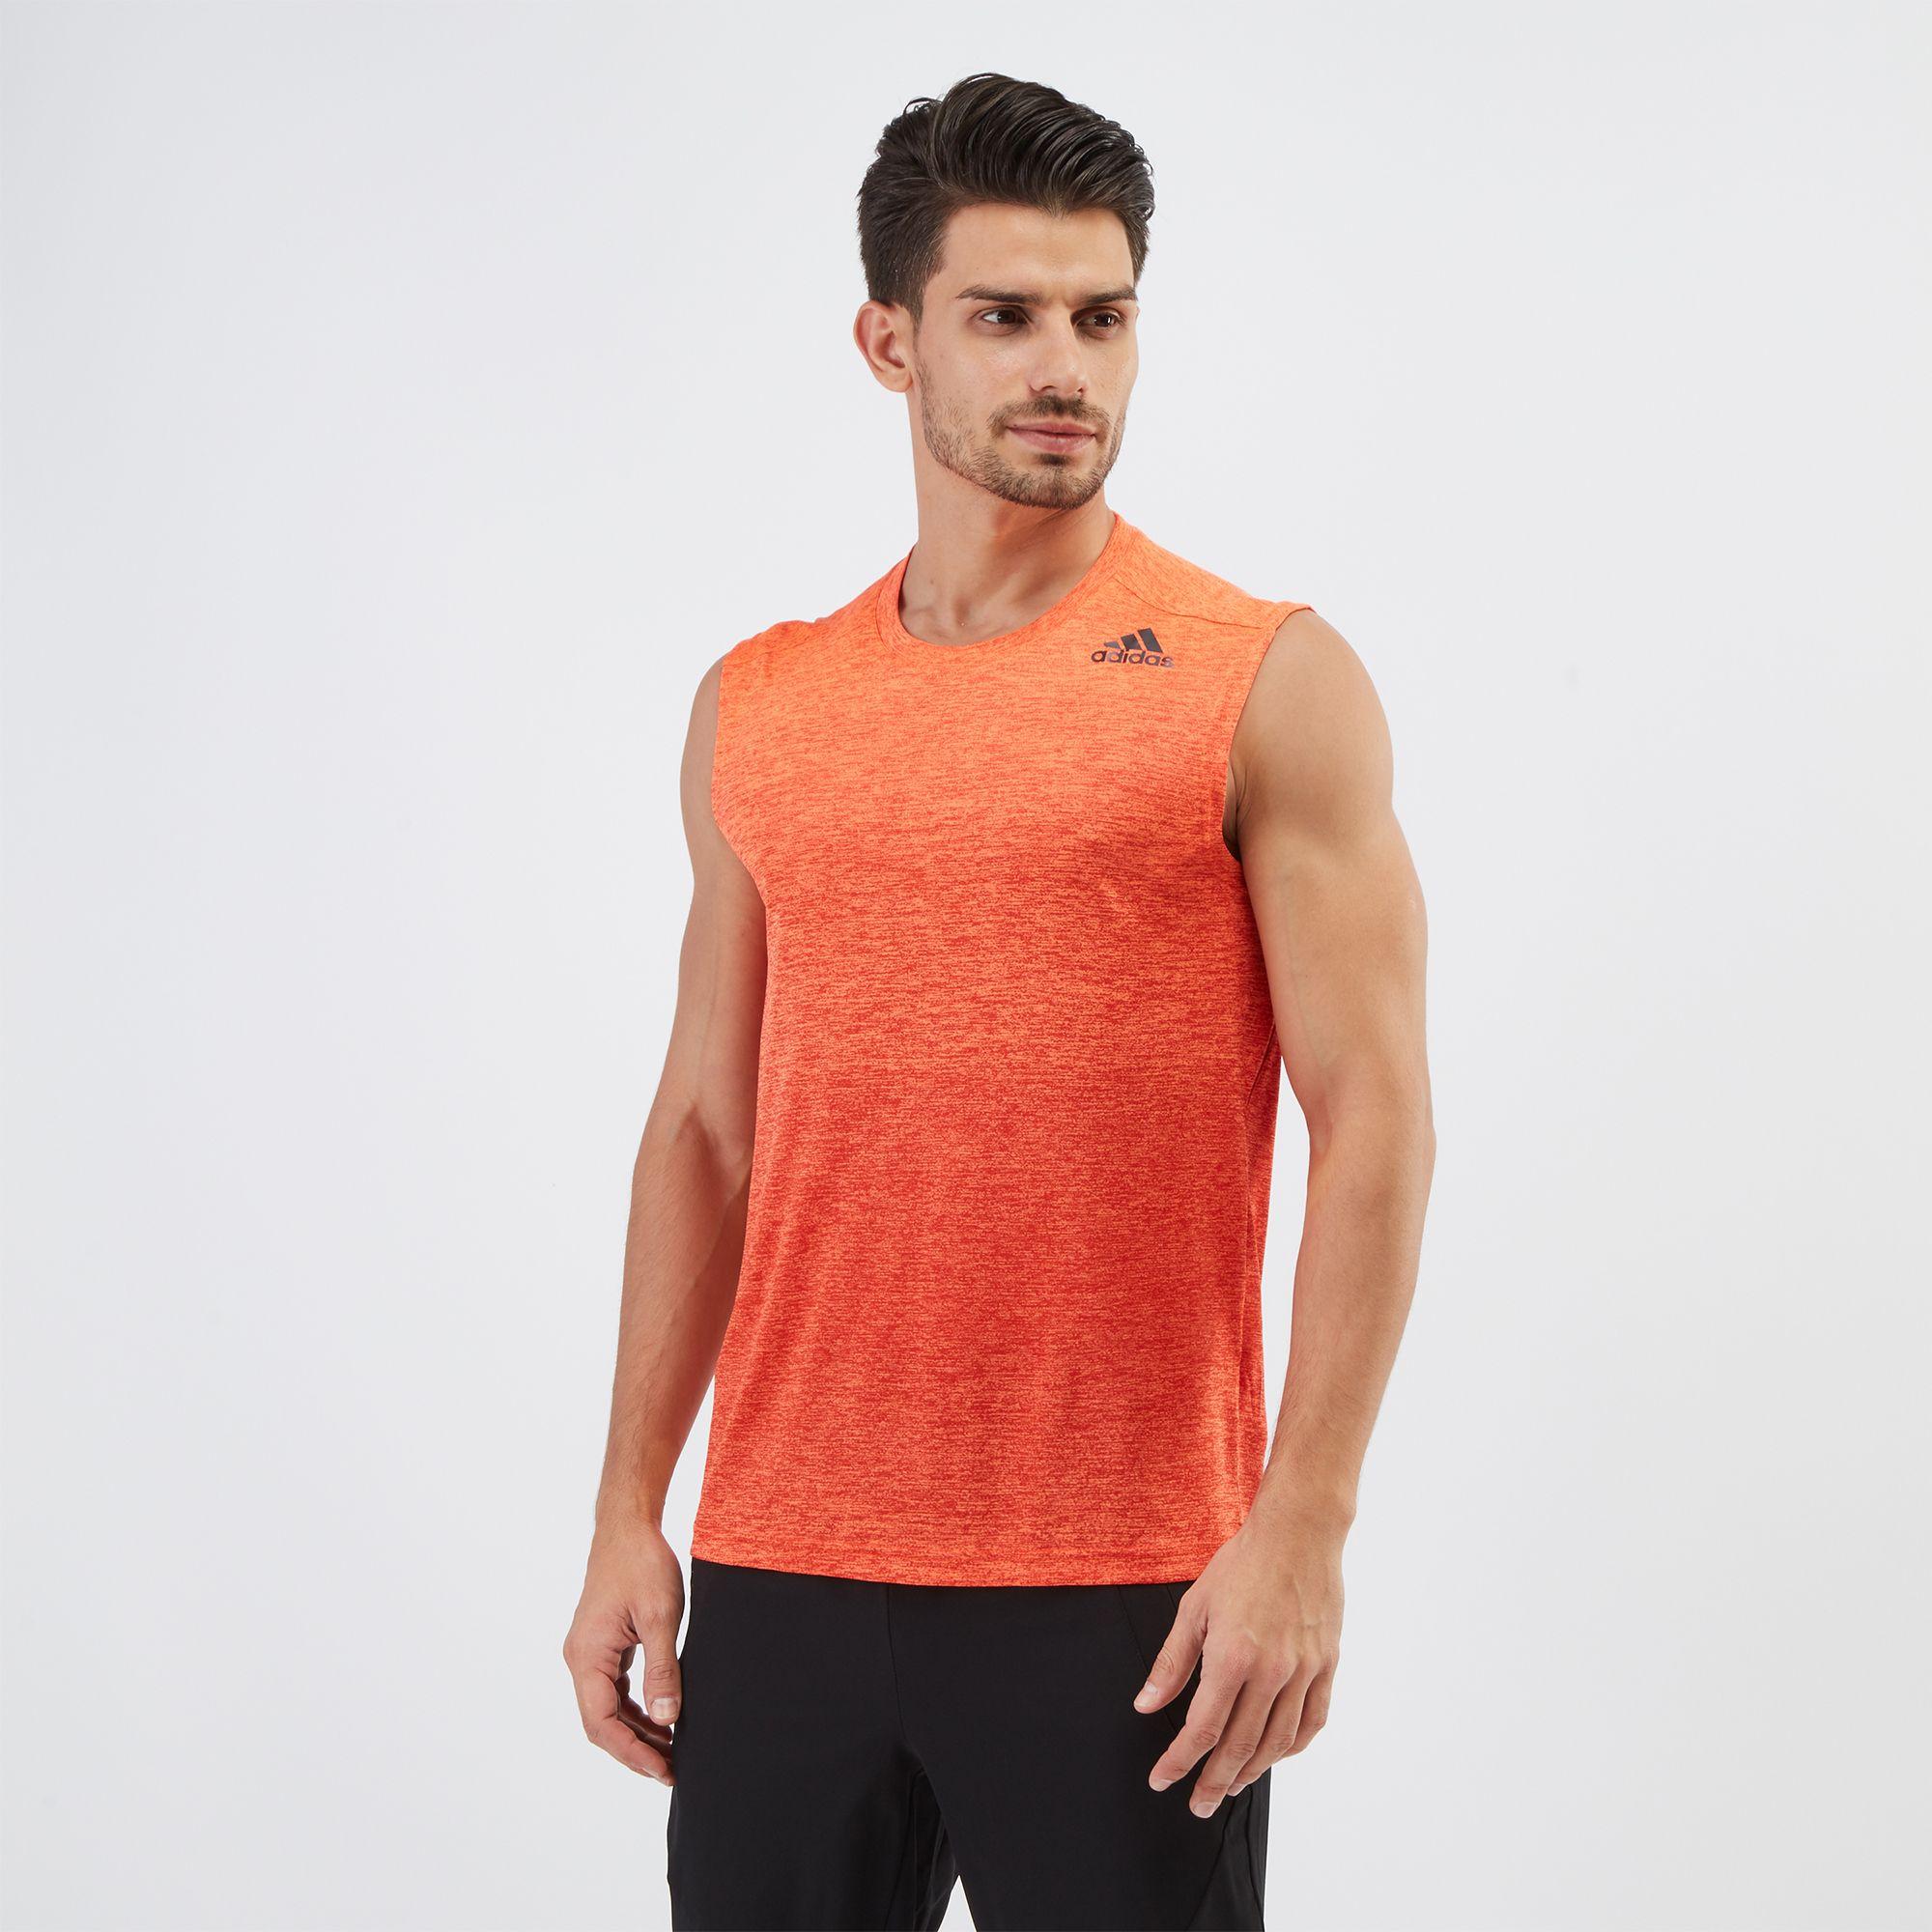 669a571cb Adidas Sleeveless Tee Shirts - Cotswold Hire